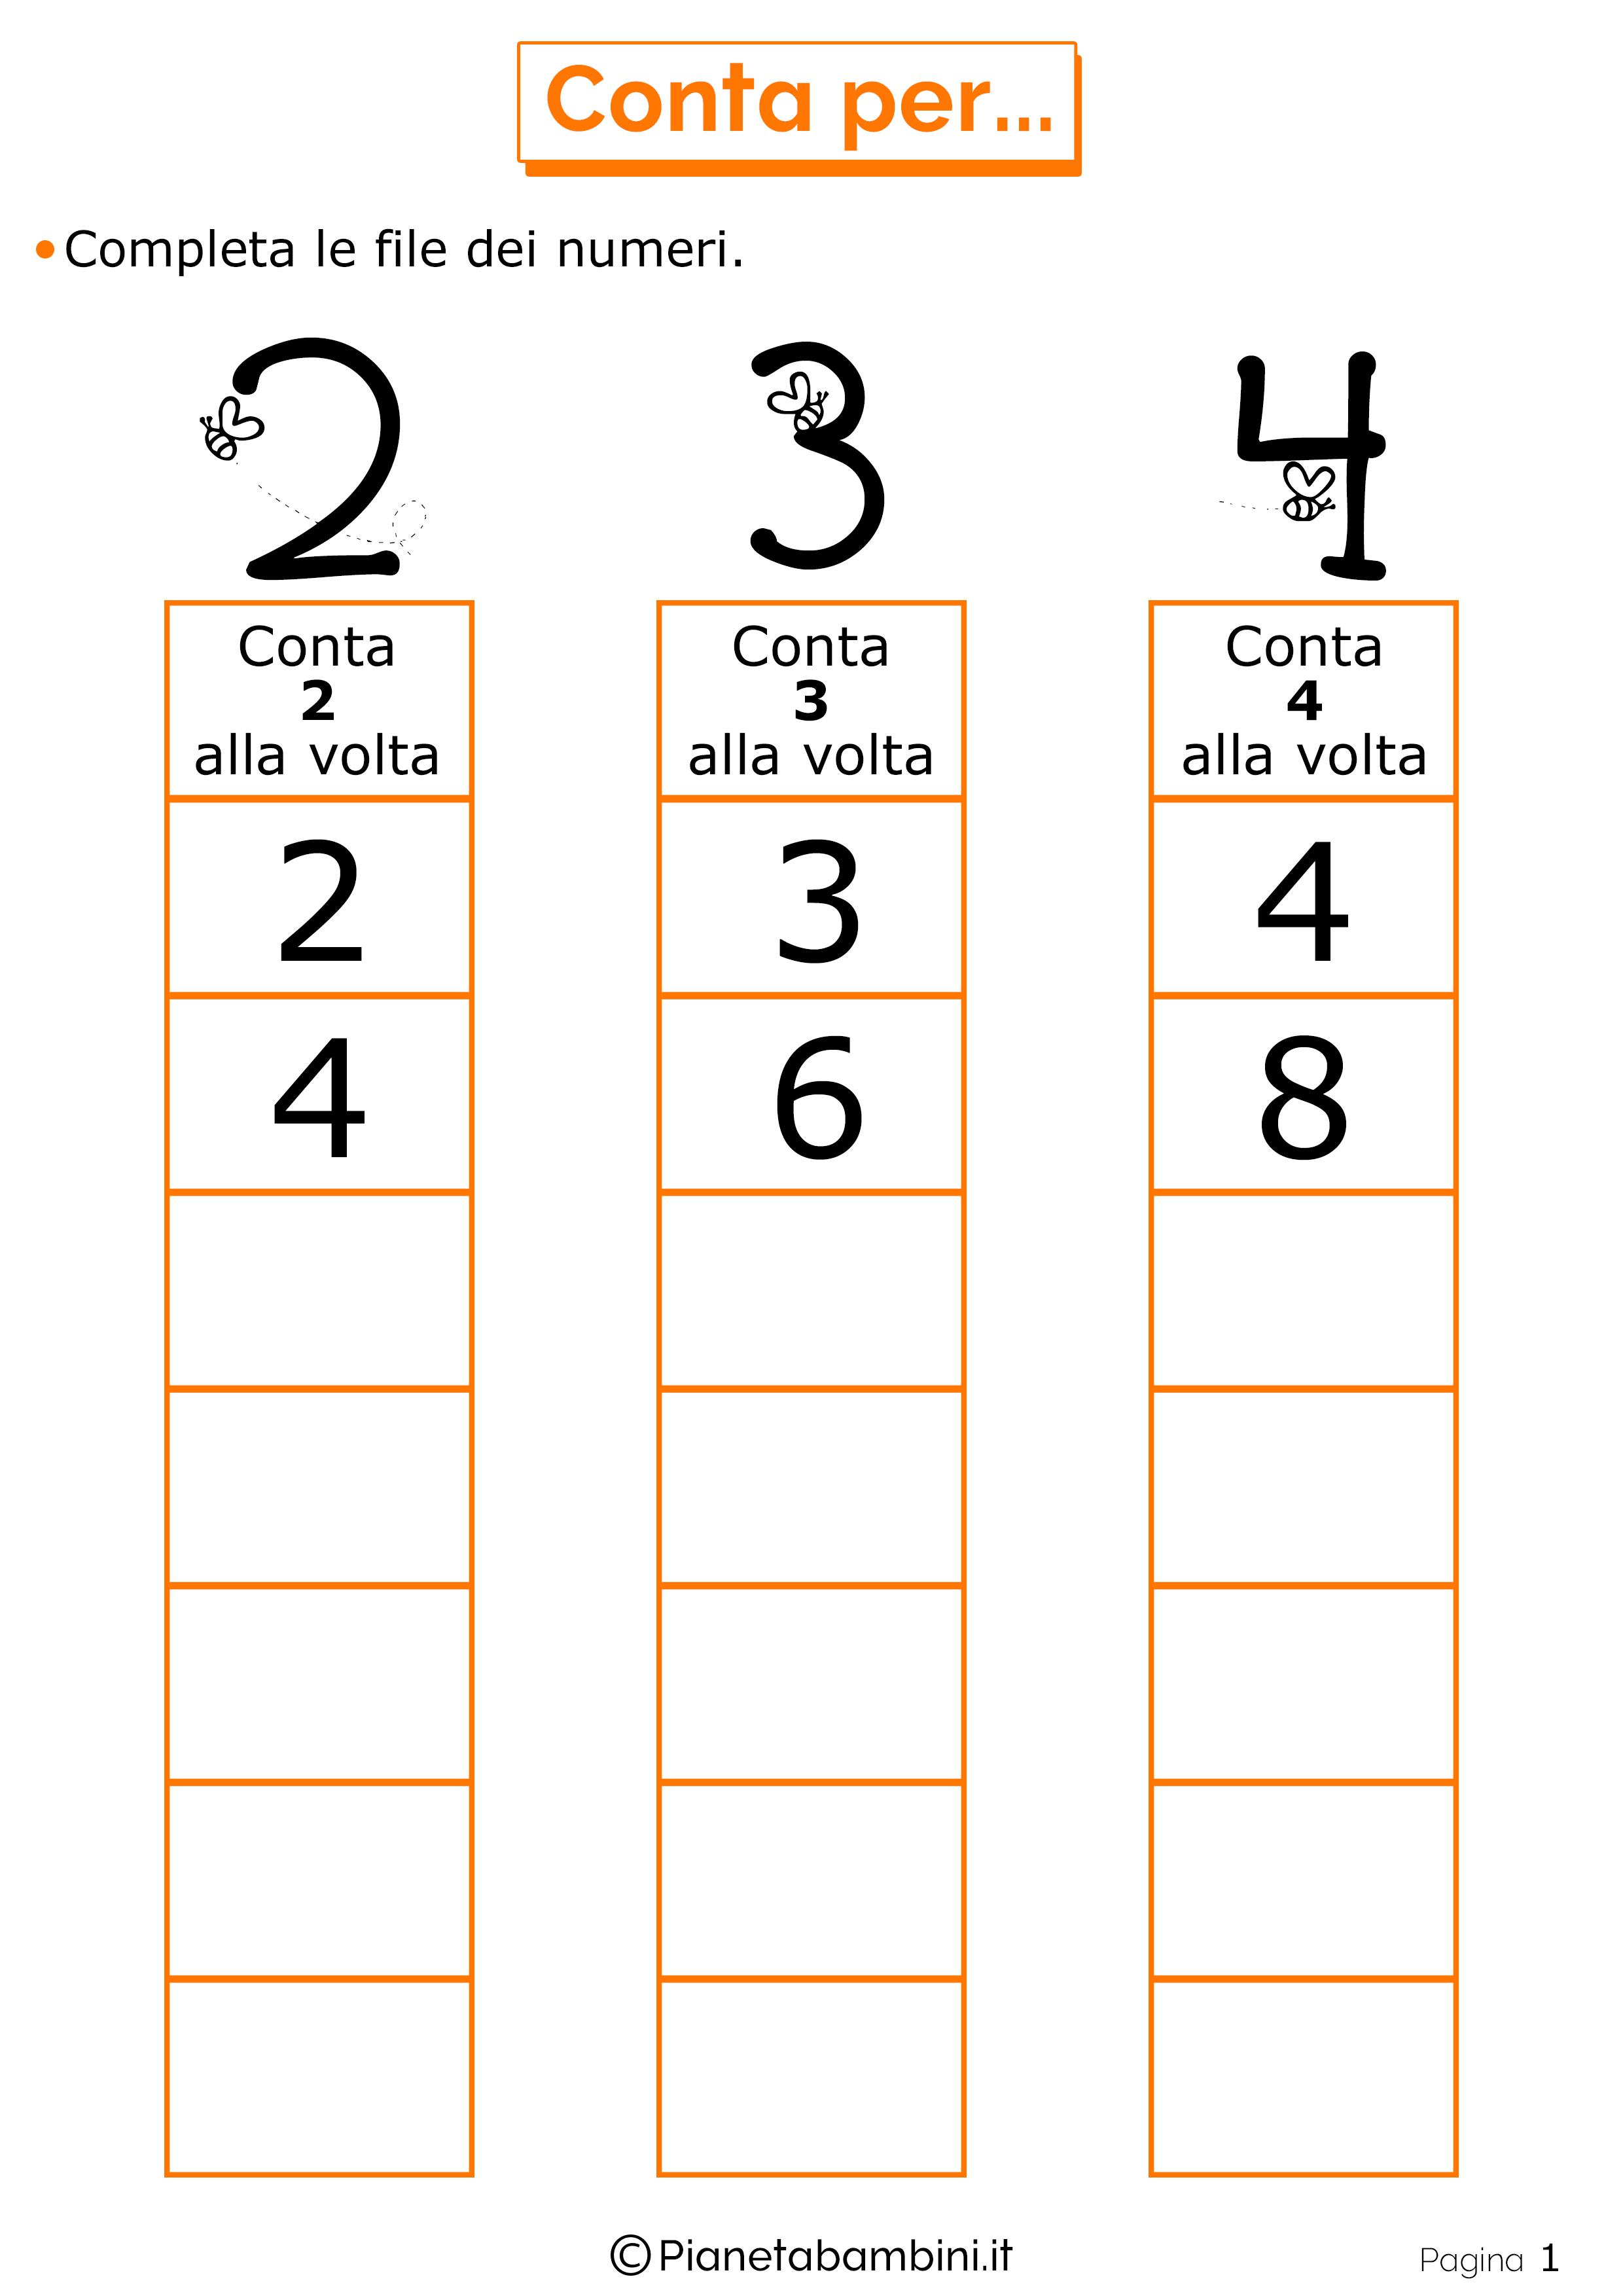 Conta-per_1